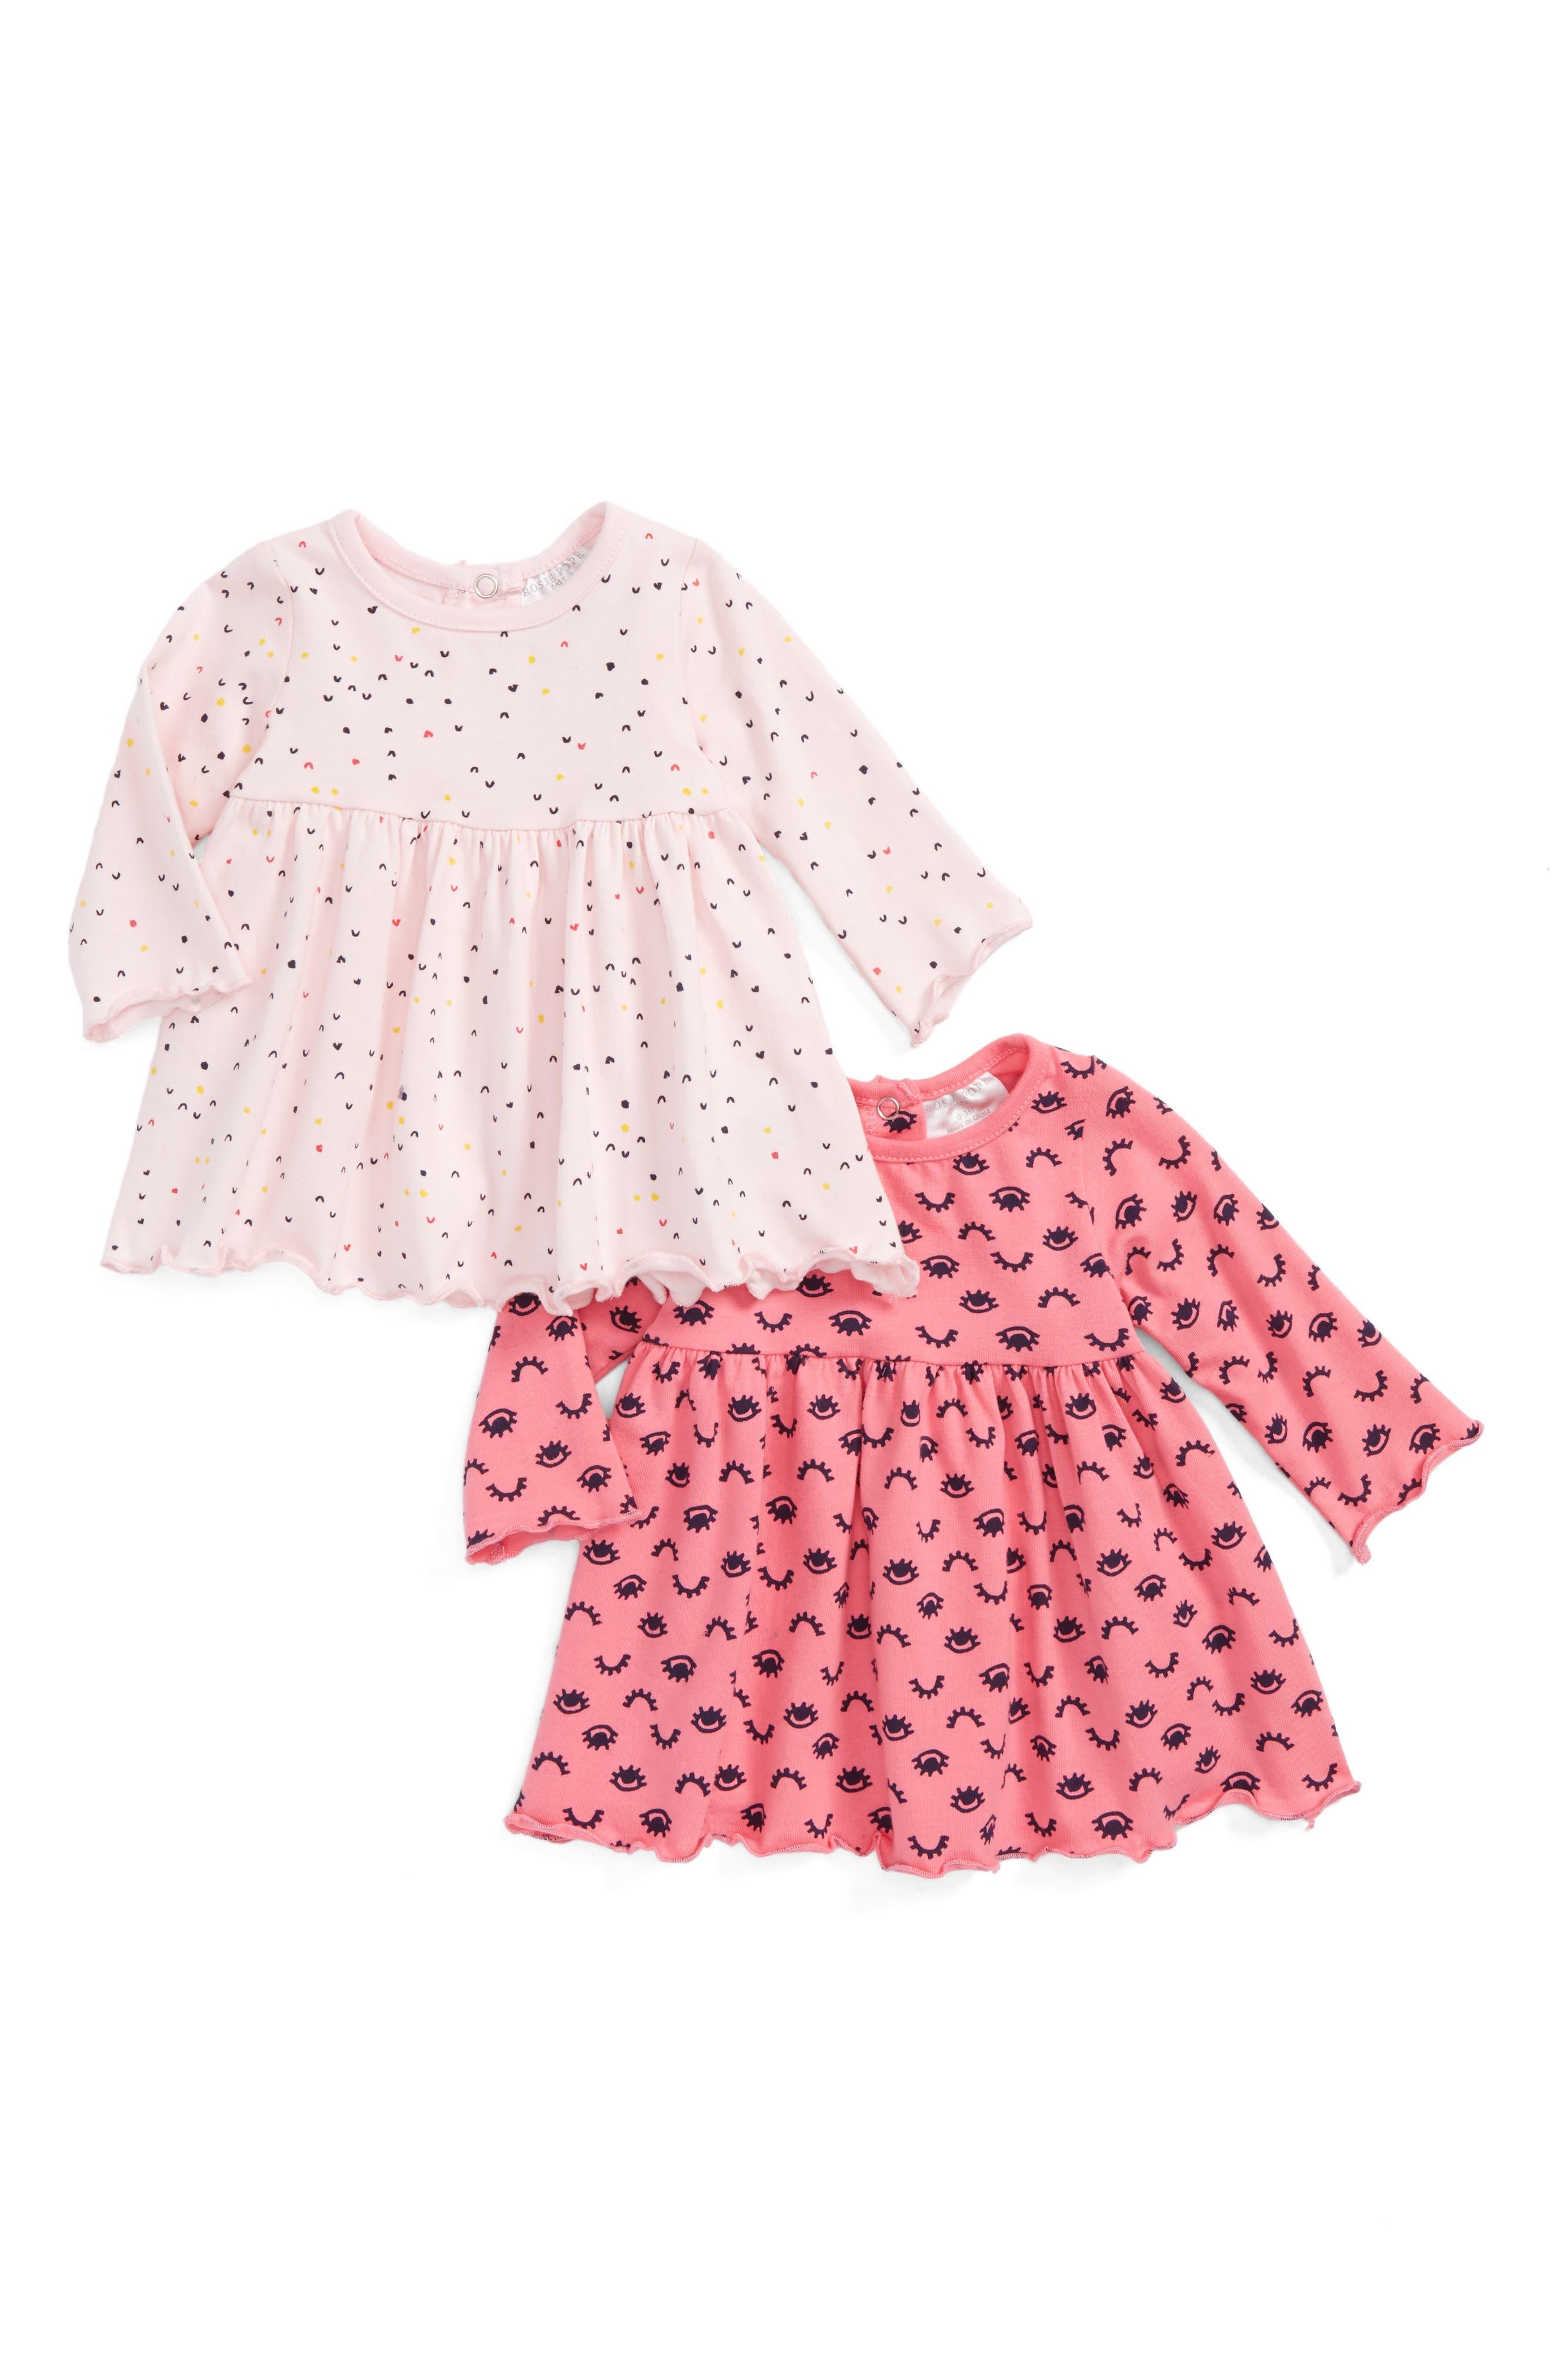 Main Image - Rosie Pope 2-Pack Print Dresses (Baby Girls)